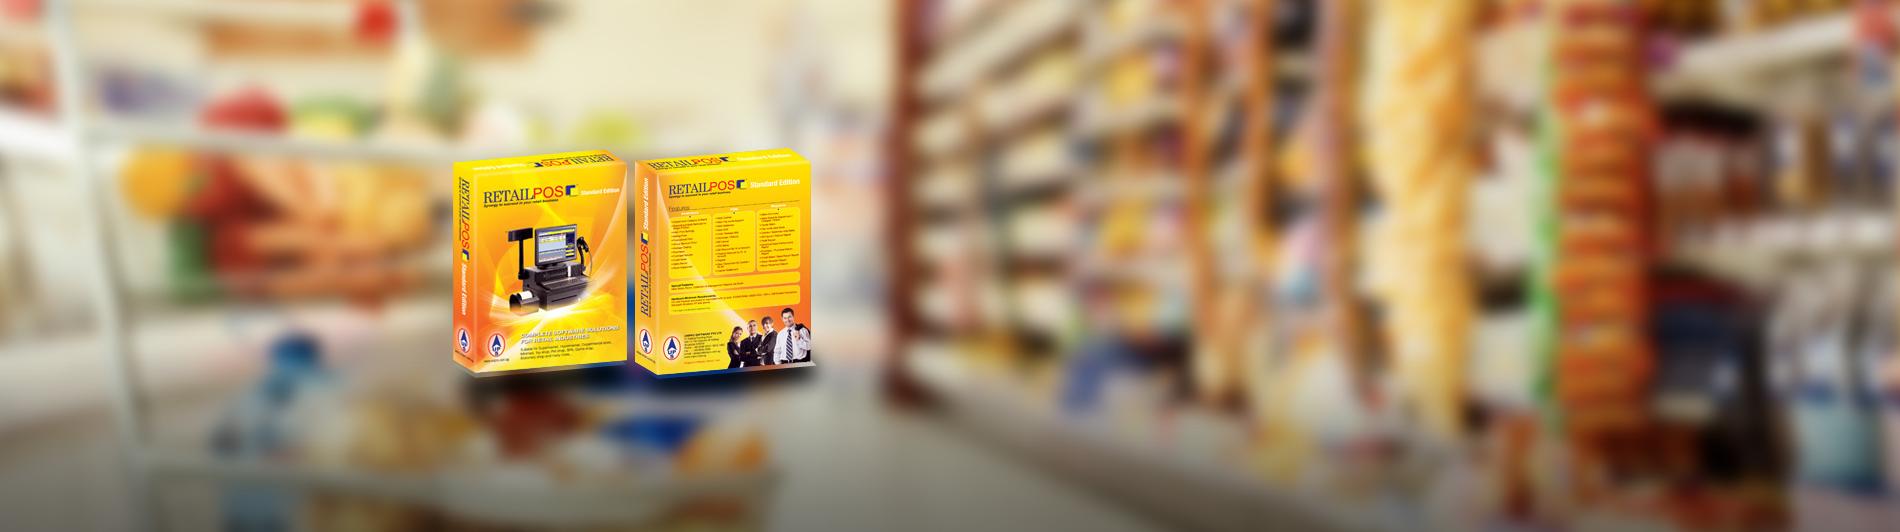 Unipro Slider-Show Retail POS (STANDARD) - 1